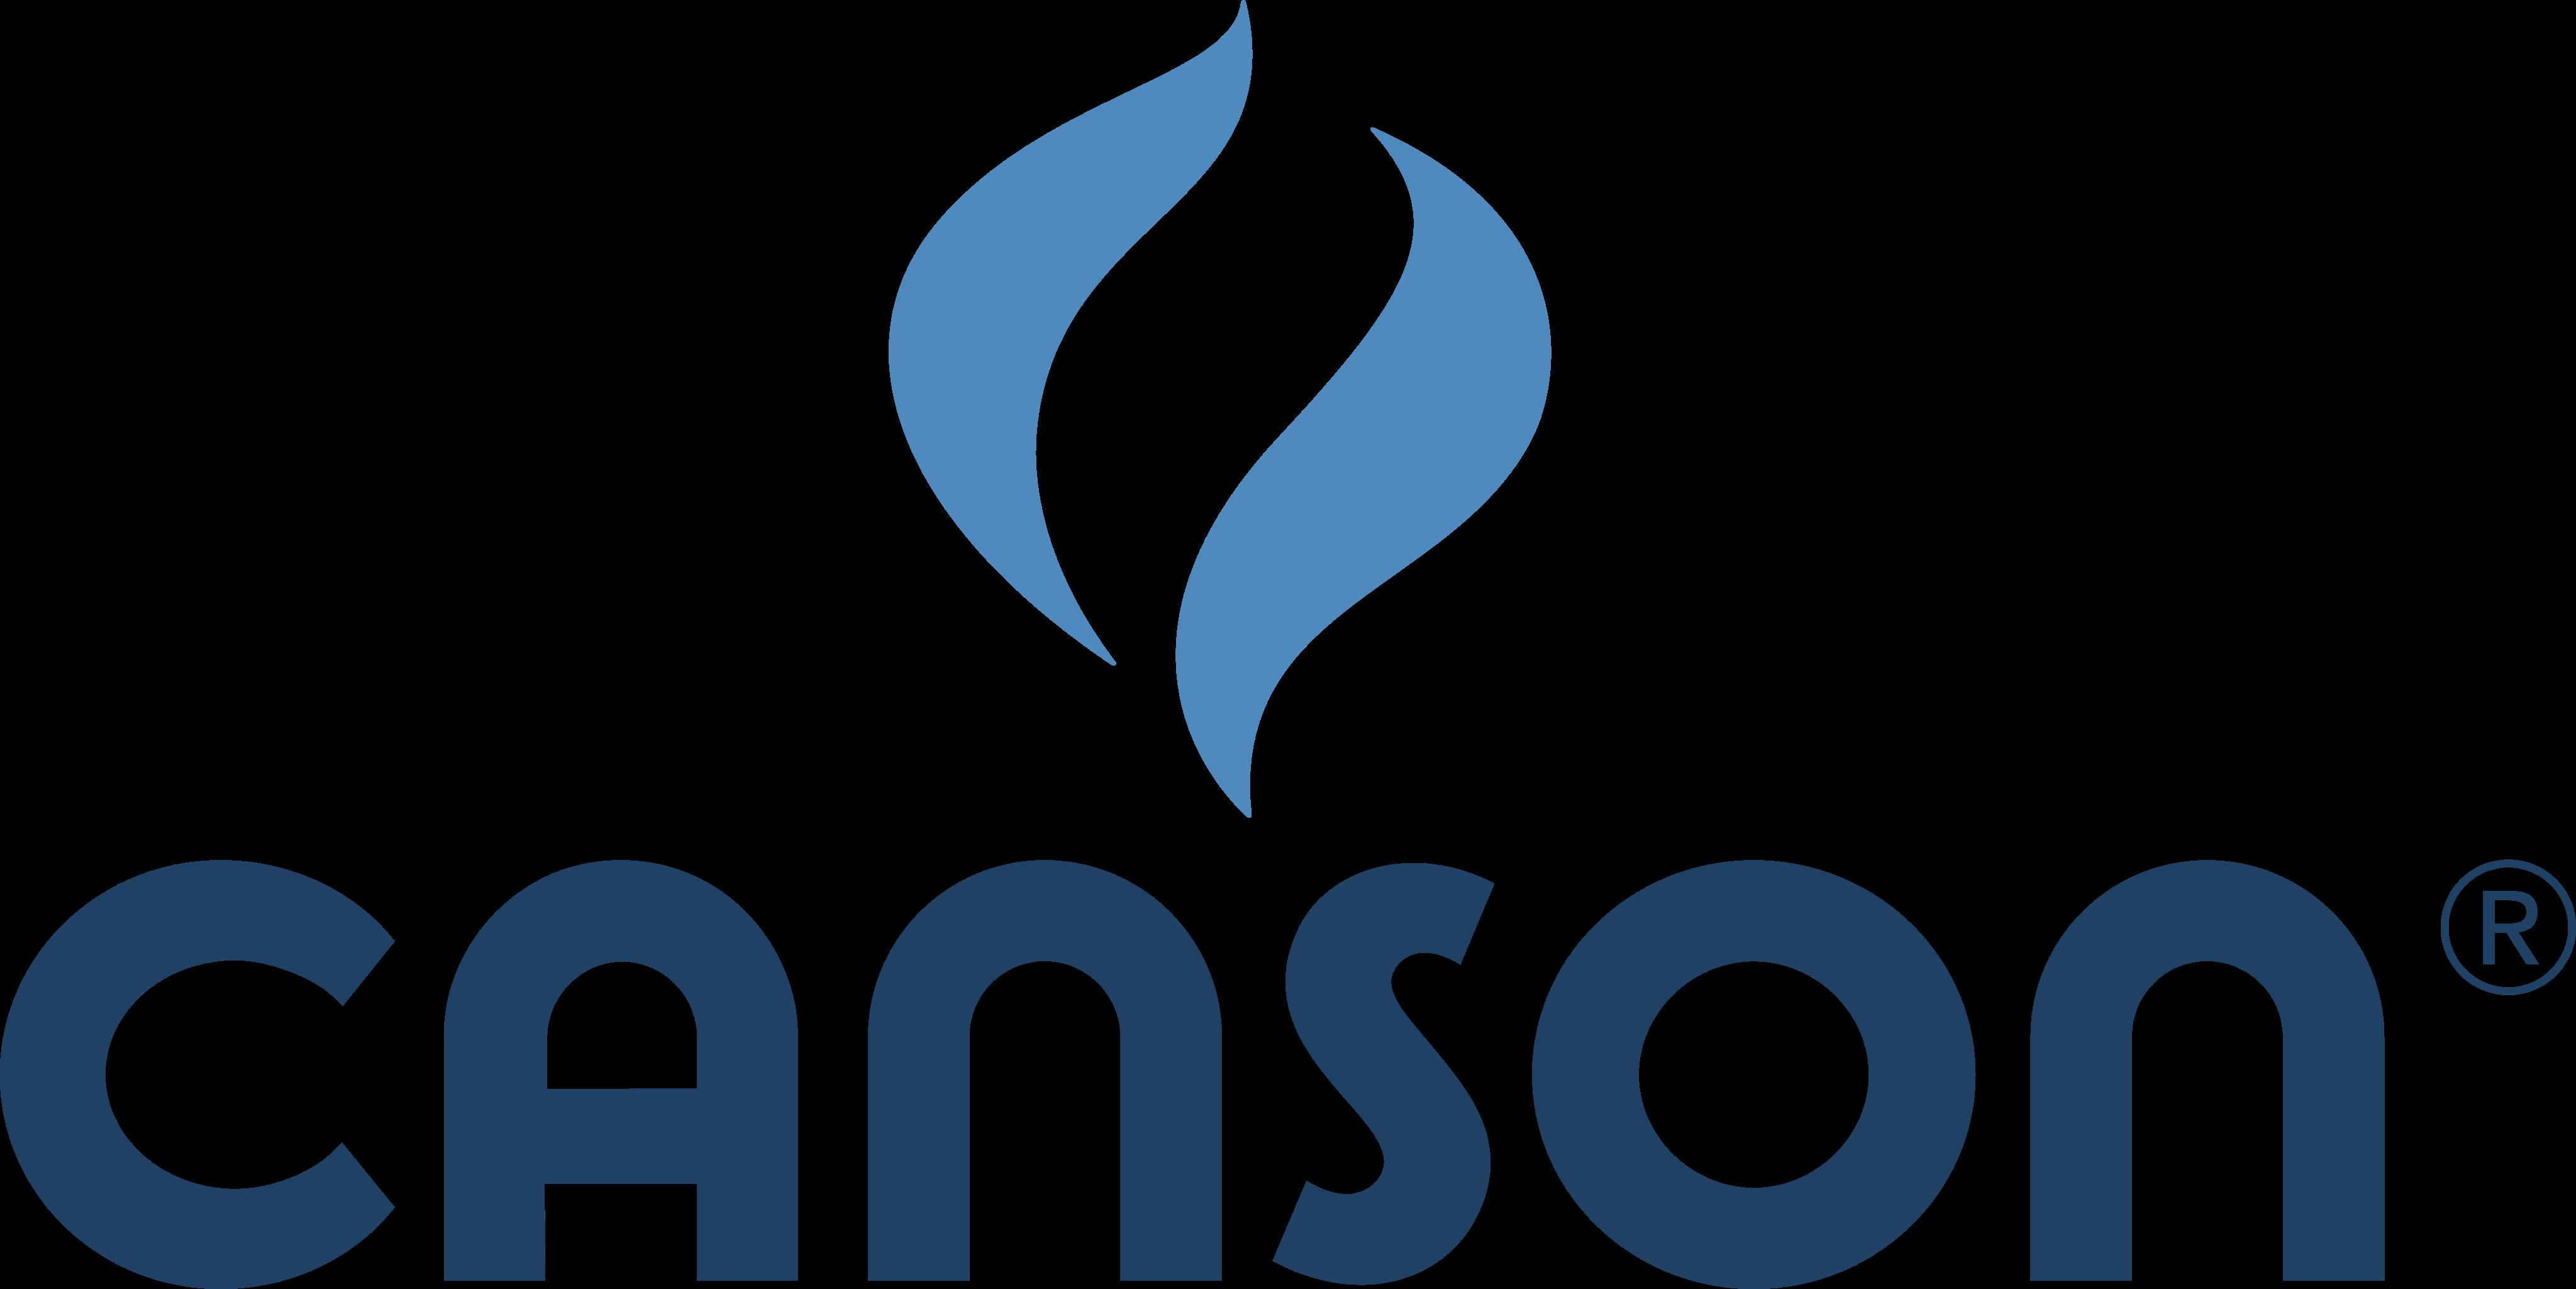 canson logo - Canson Logo